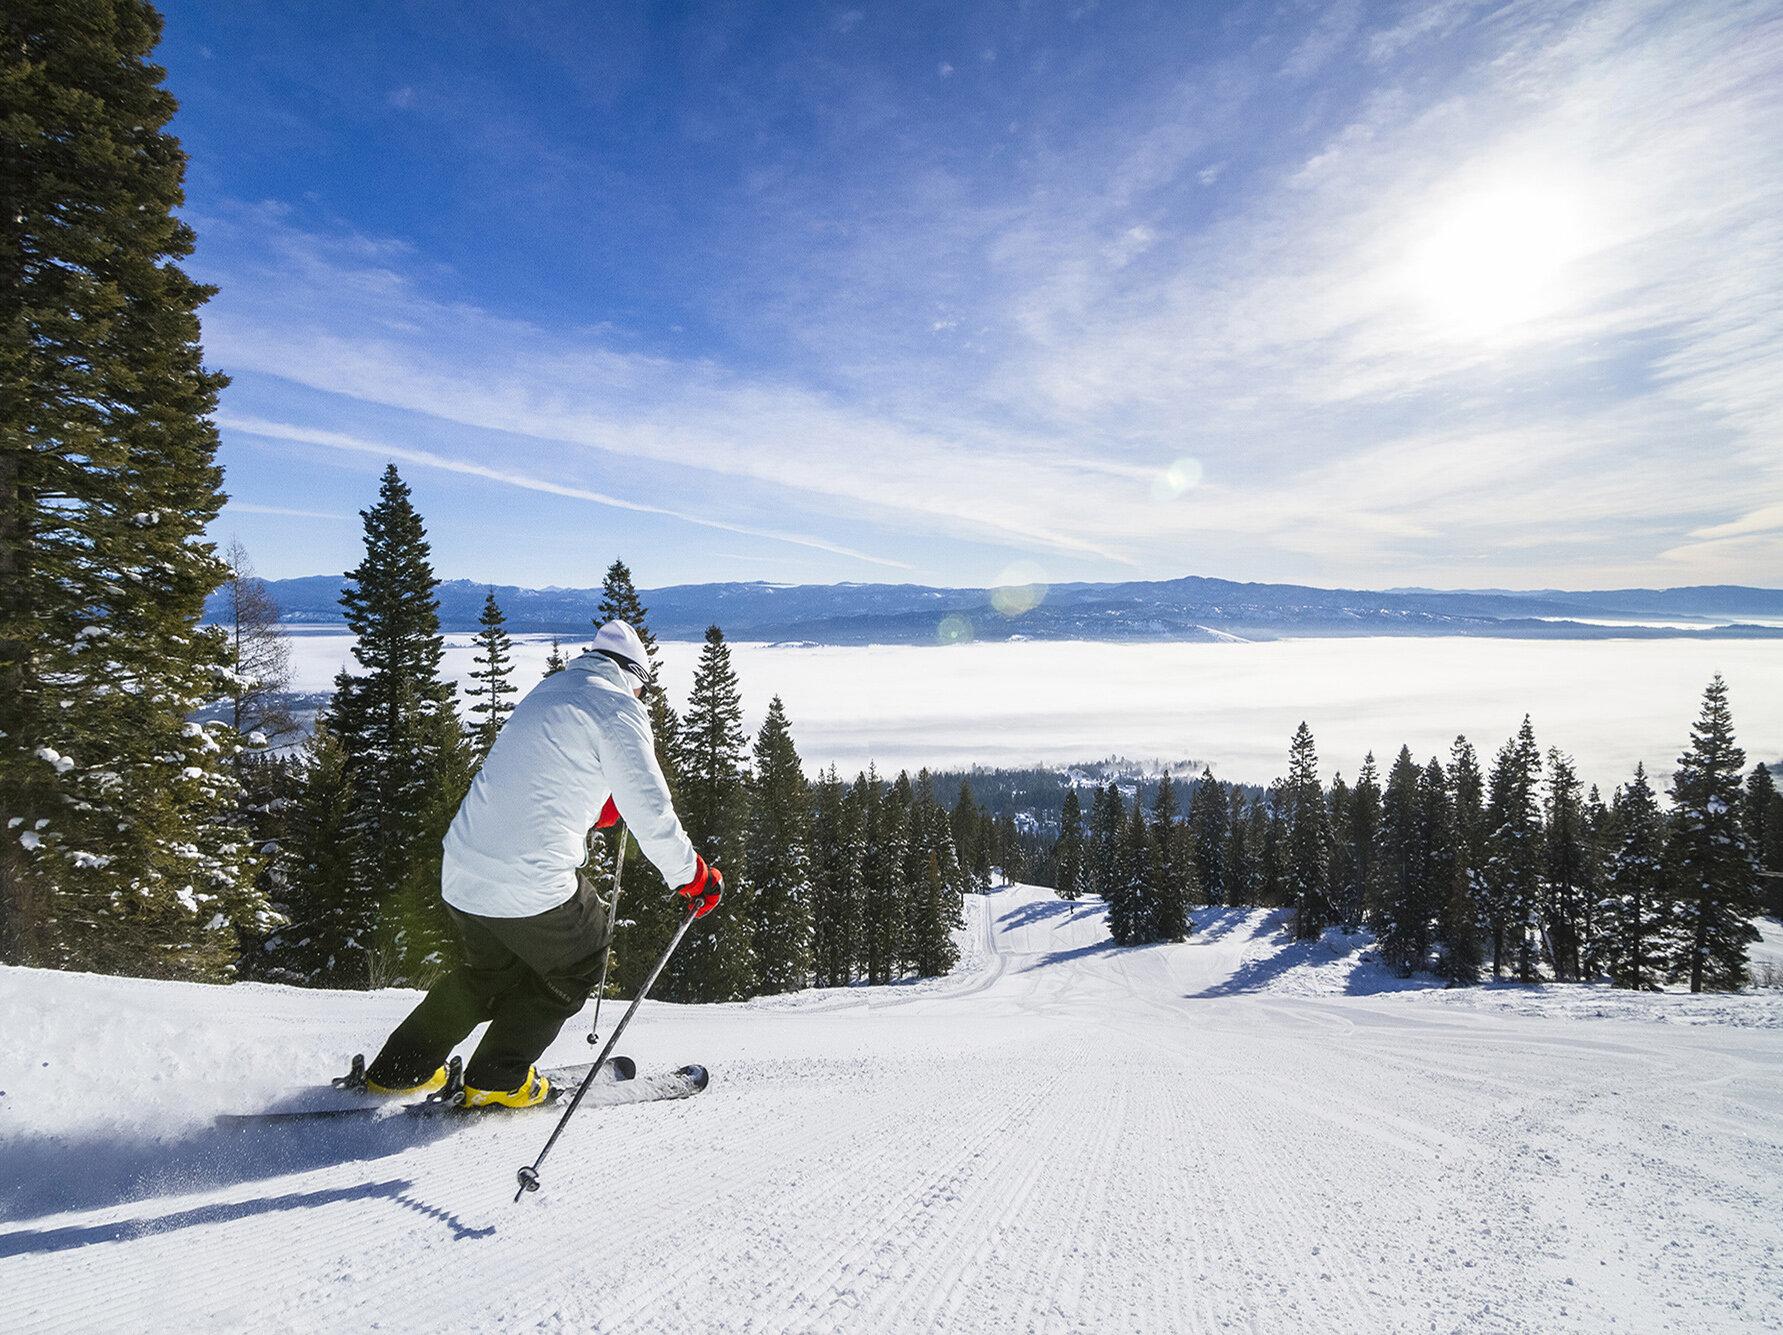 Skier-website2.jpg